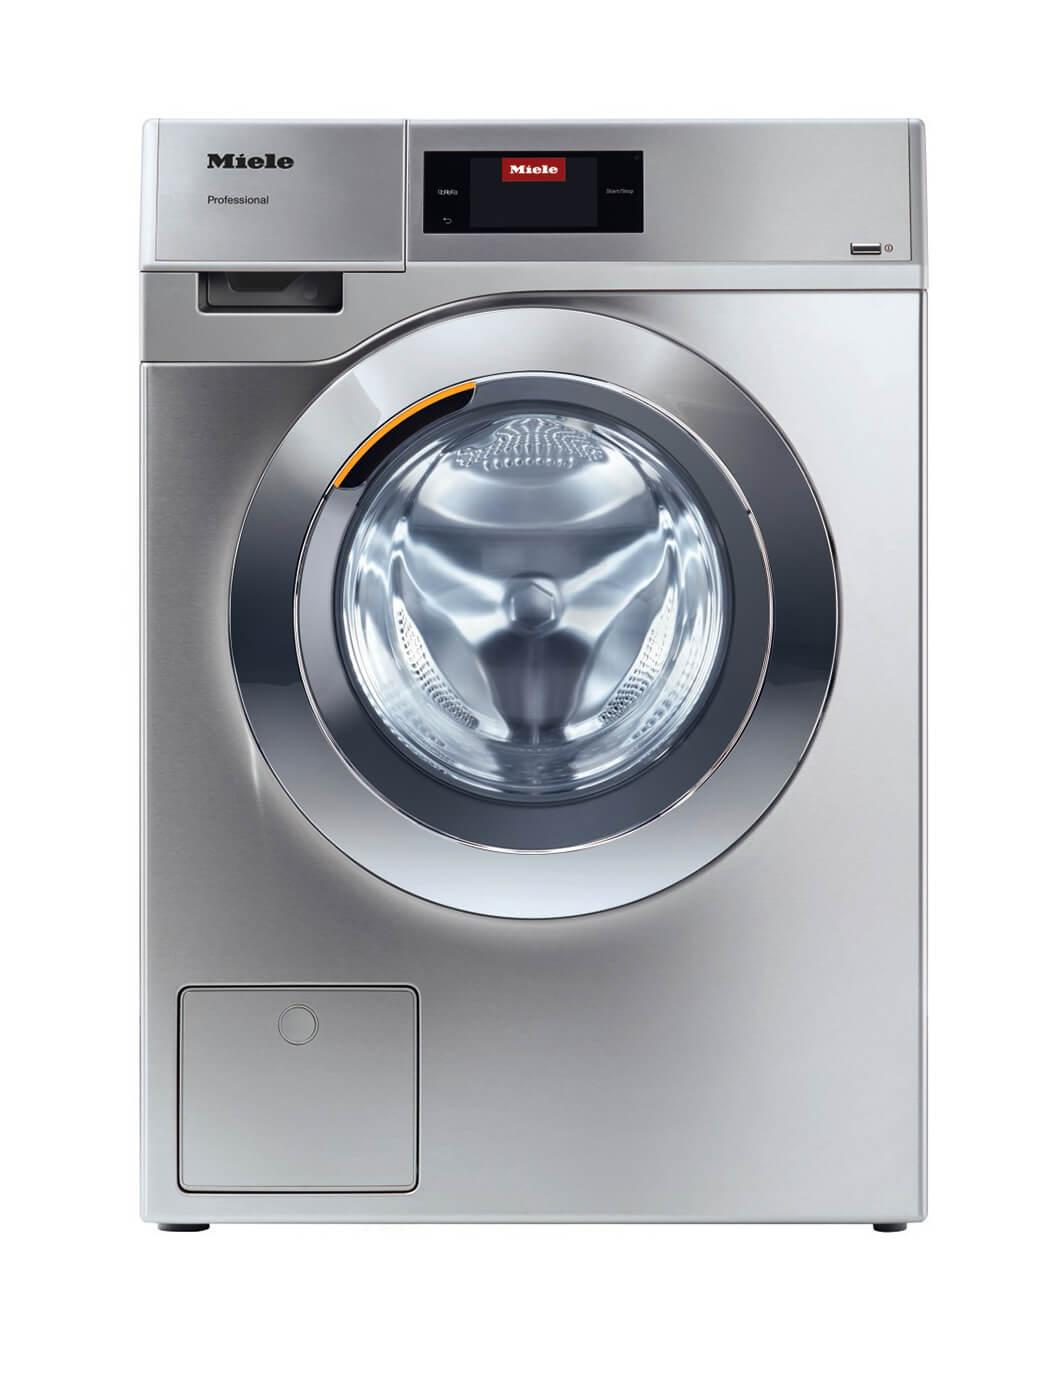 miele pwm908 inox 8 kg machine a laver miele professionnelle